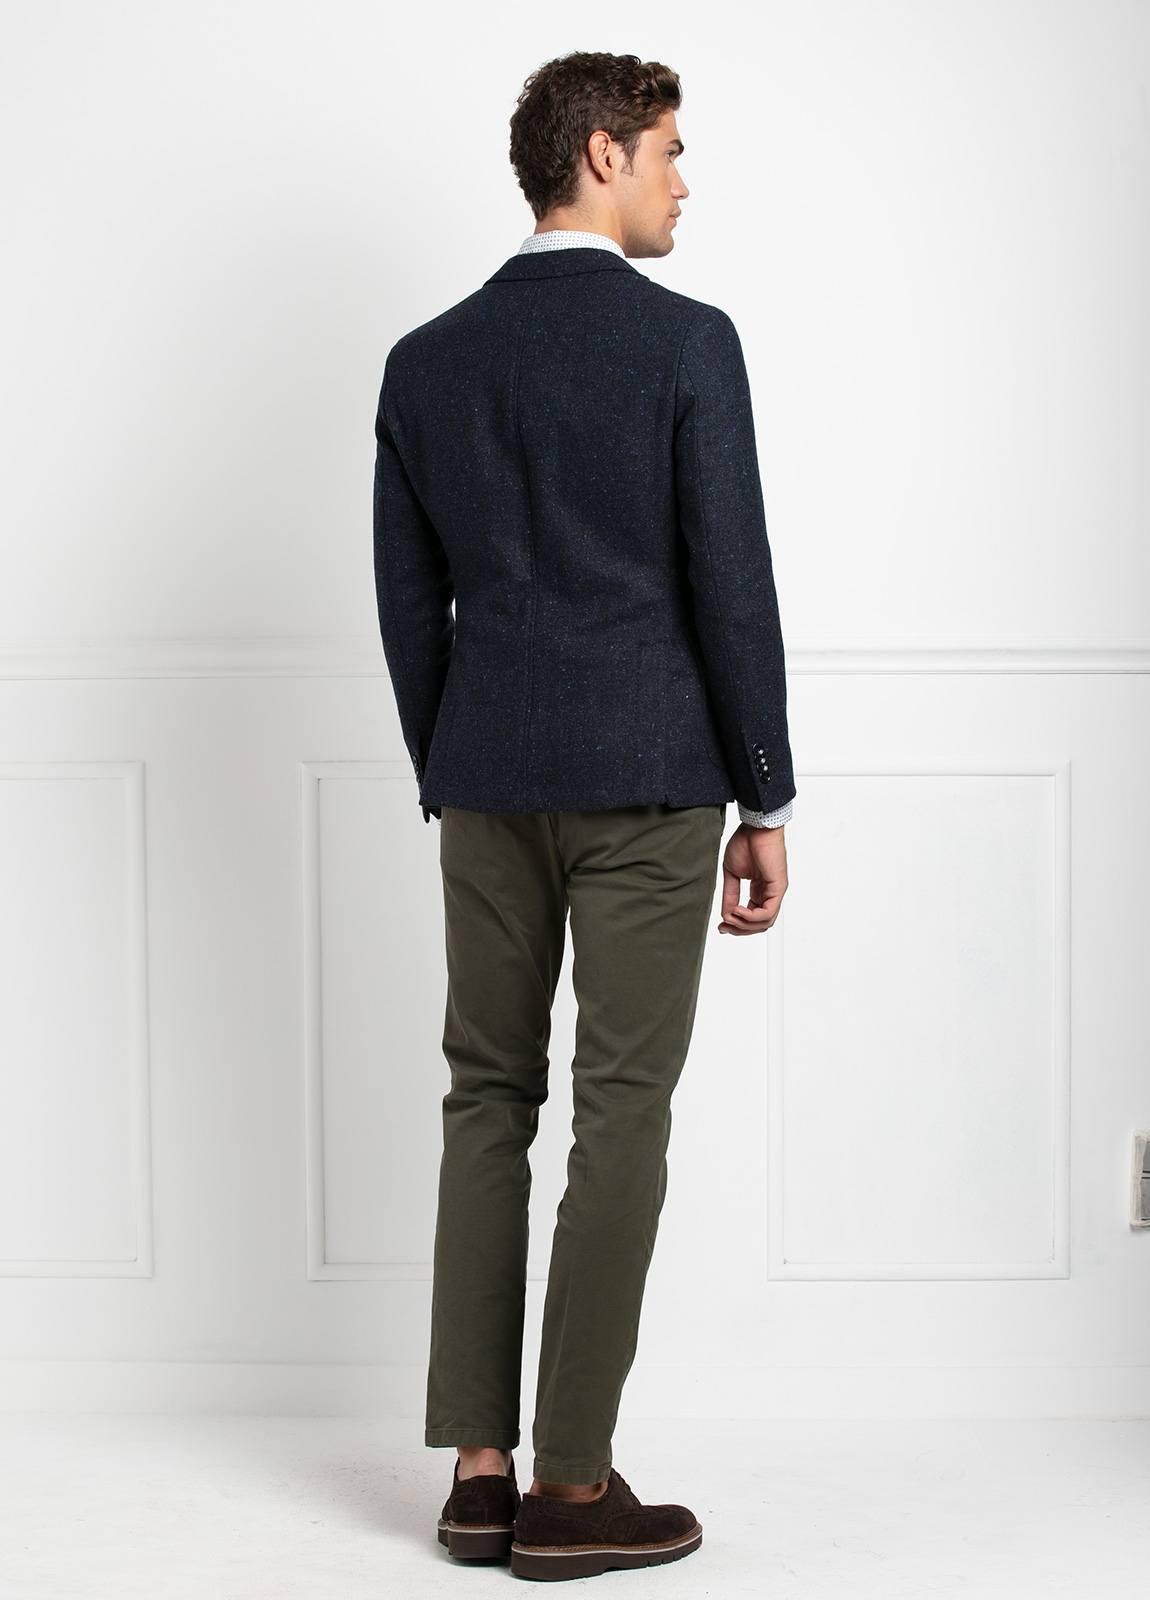 Americana SOFT JACKET Slim Fit, tejido textura color azul oscuro. 100% Lana. - Ítem1